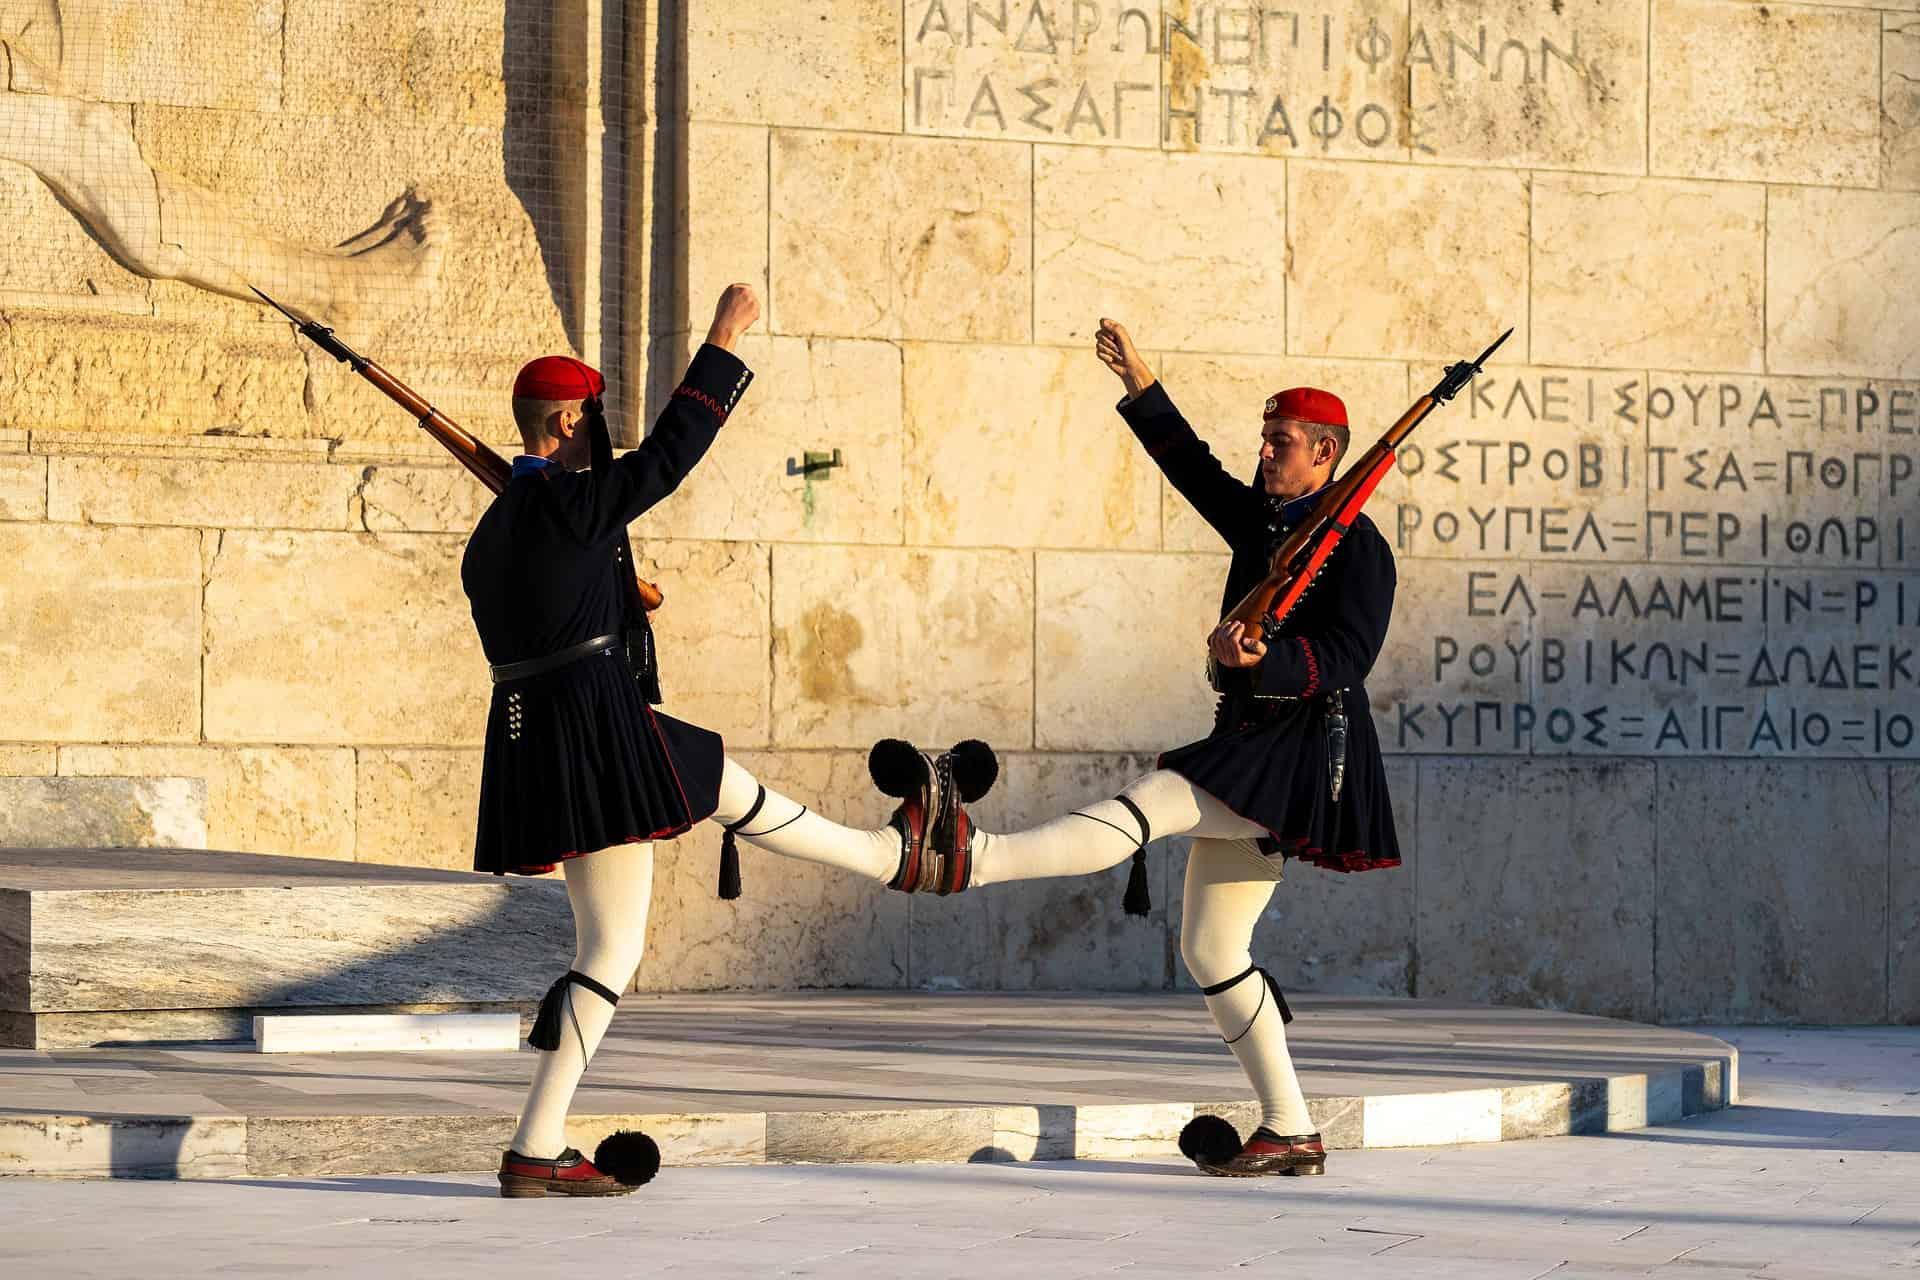 Athen Gay Dance Clubs